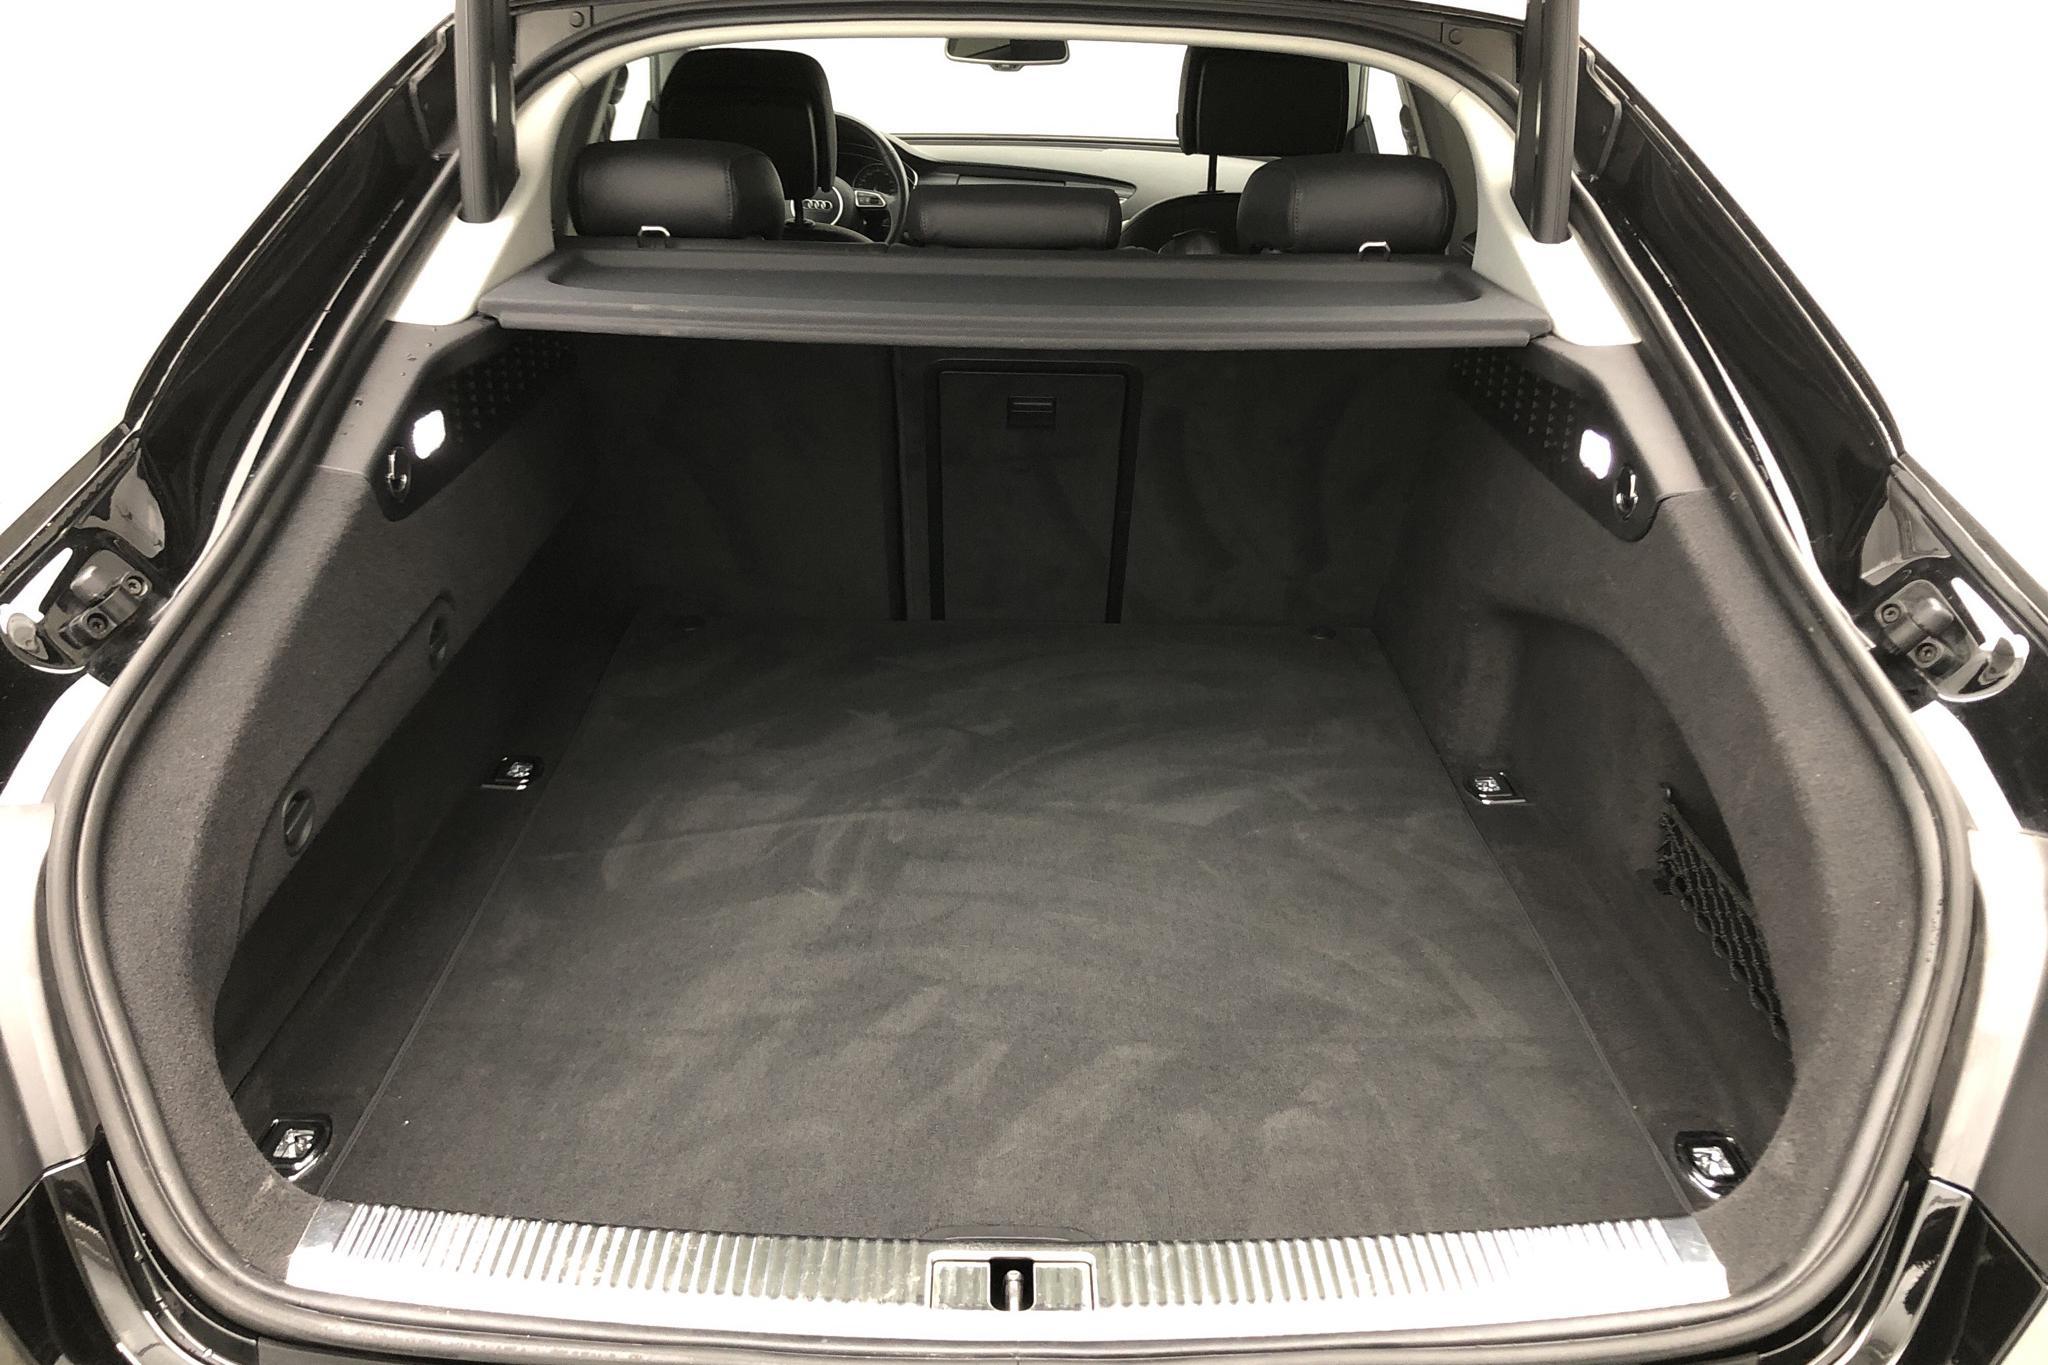 Audi A7 2.0 TFSI Sportback quattro (252hk) - 65 000 km - Automatic - black - 2018